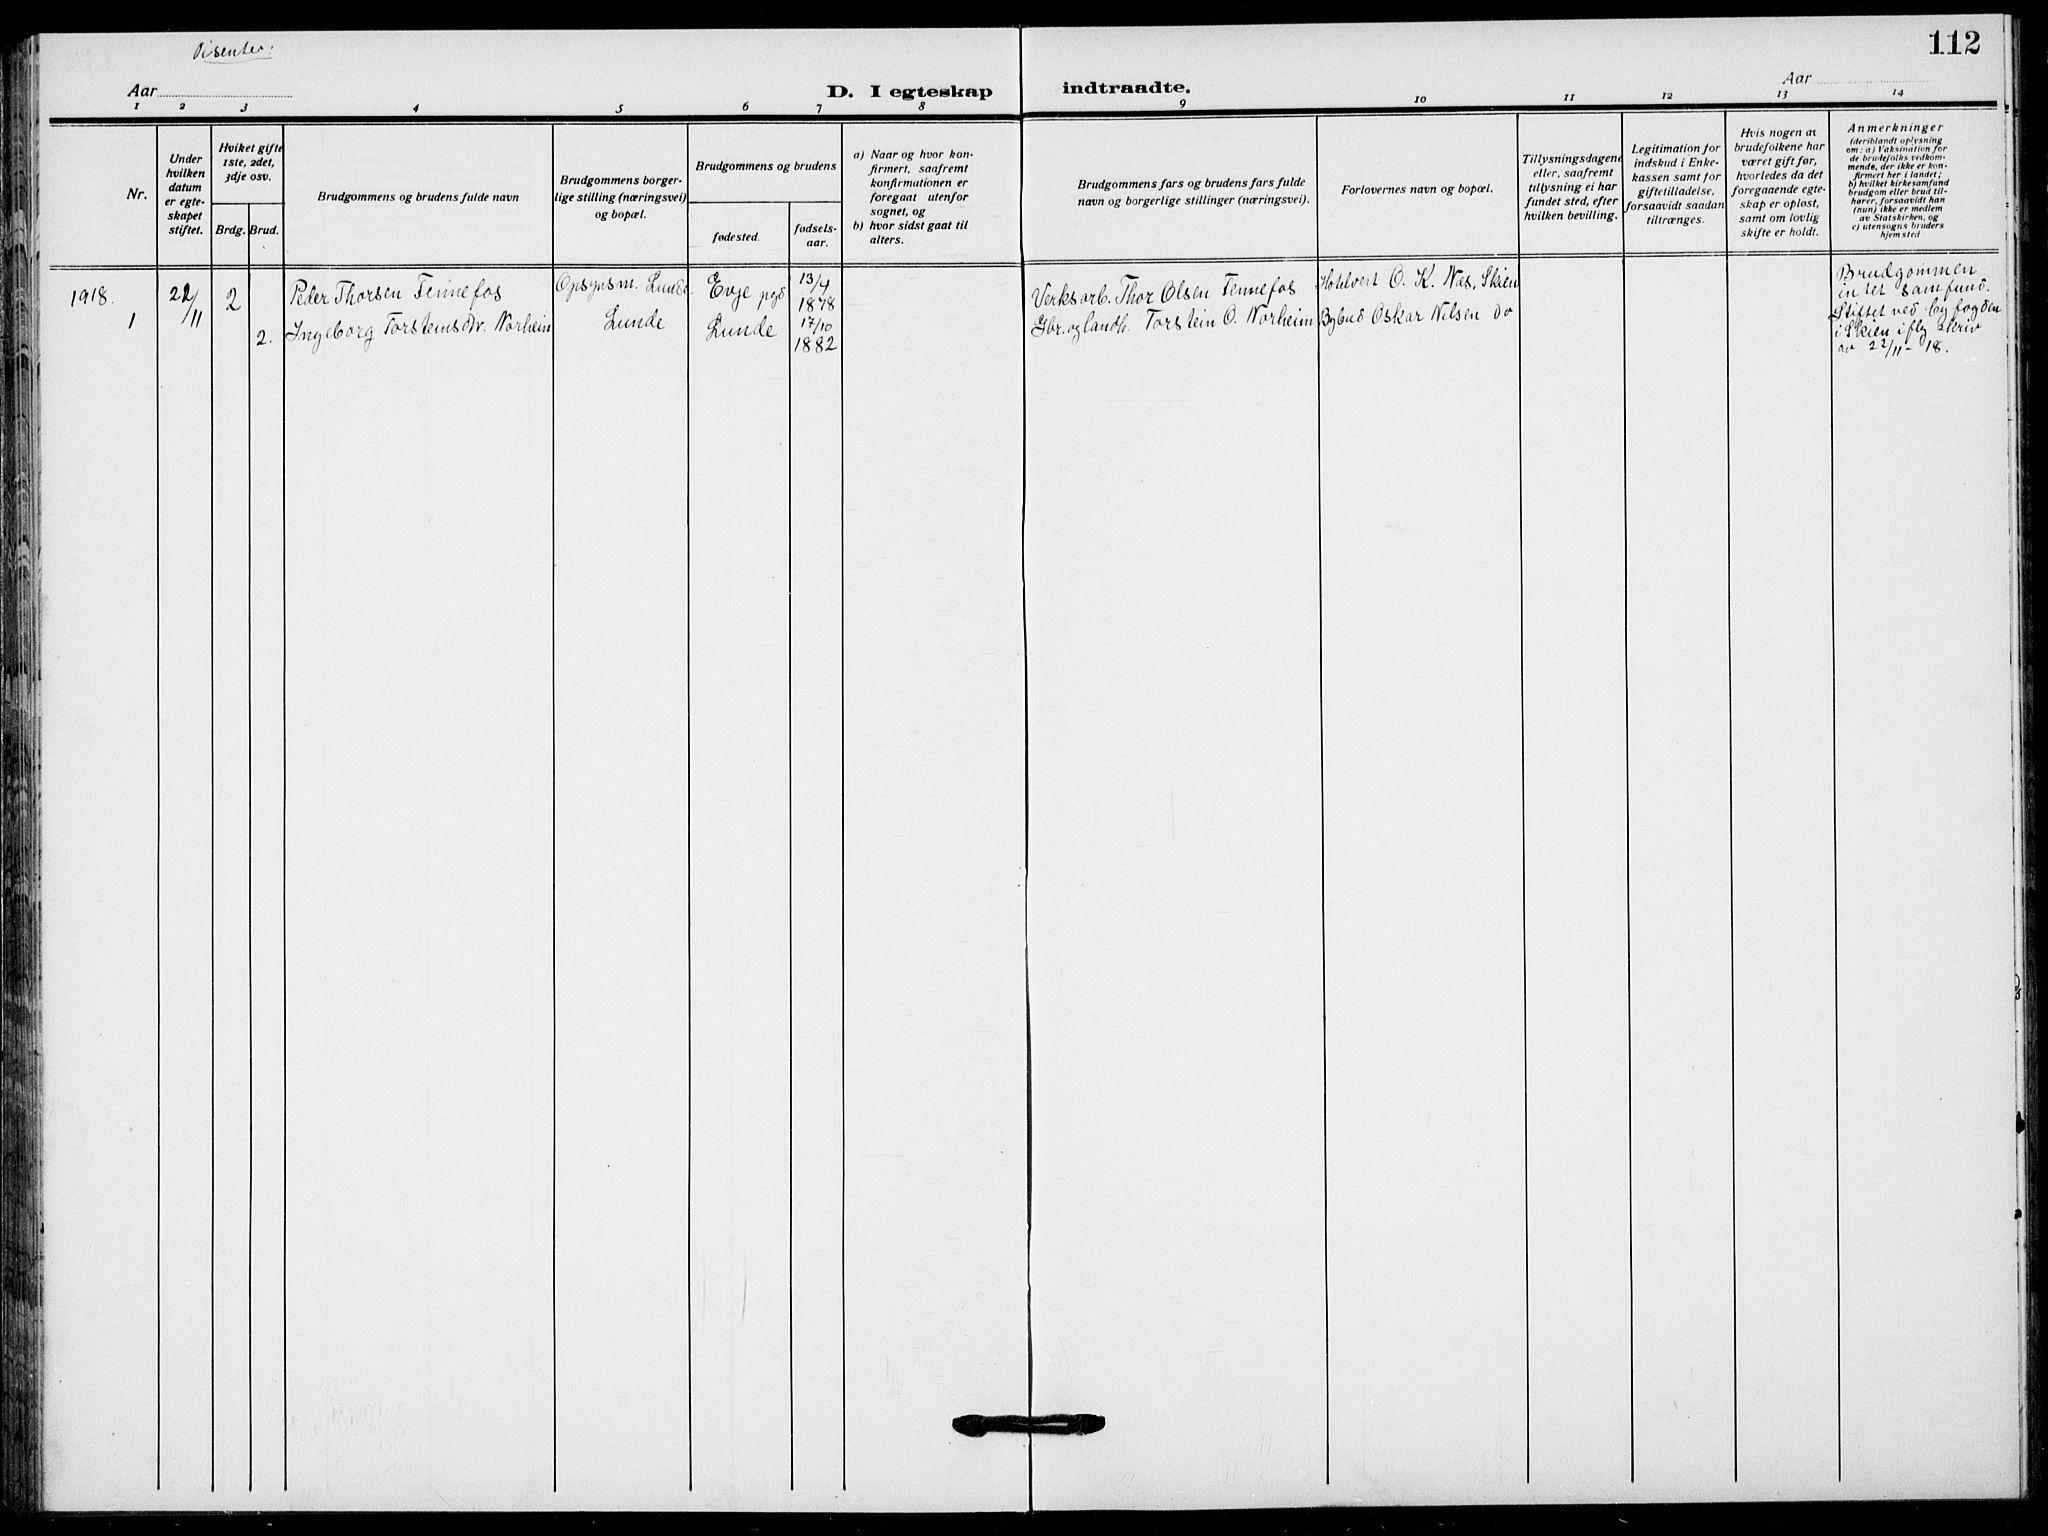 SAKO, Lunde kirkebøker, F/Fa/L0005: Ministerialbok nr. I 5, 1914-1922, s. 112